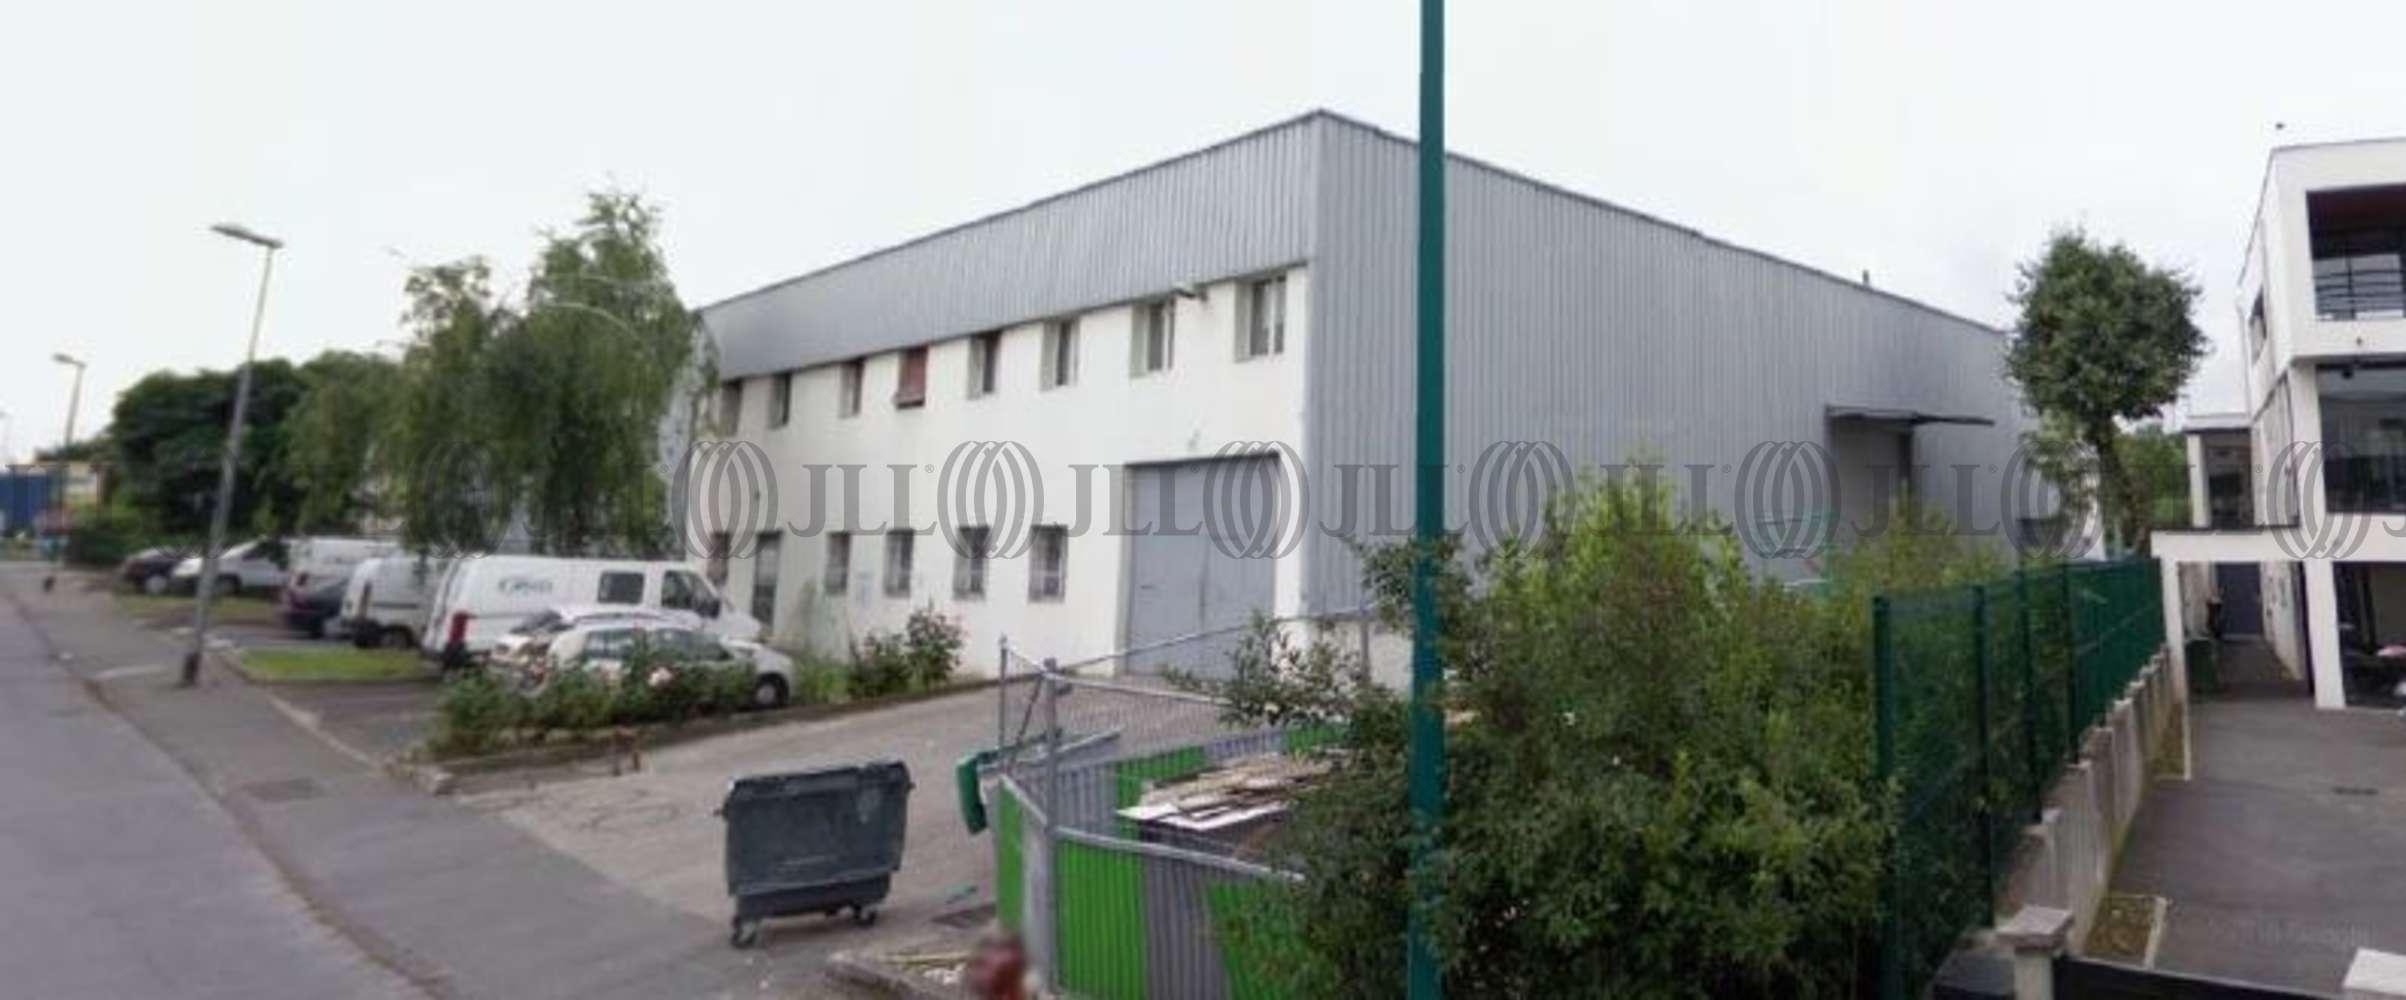 Activités/entrepôt Fontenay sous bois, 94120